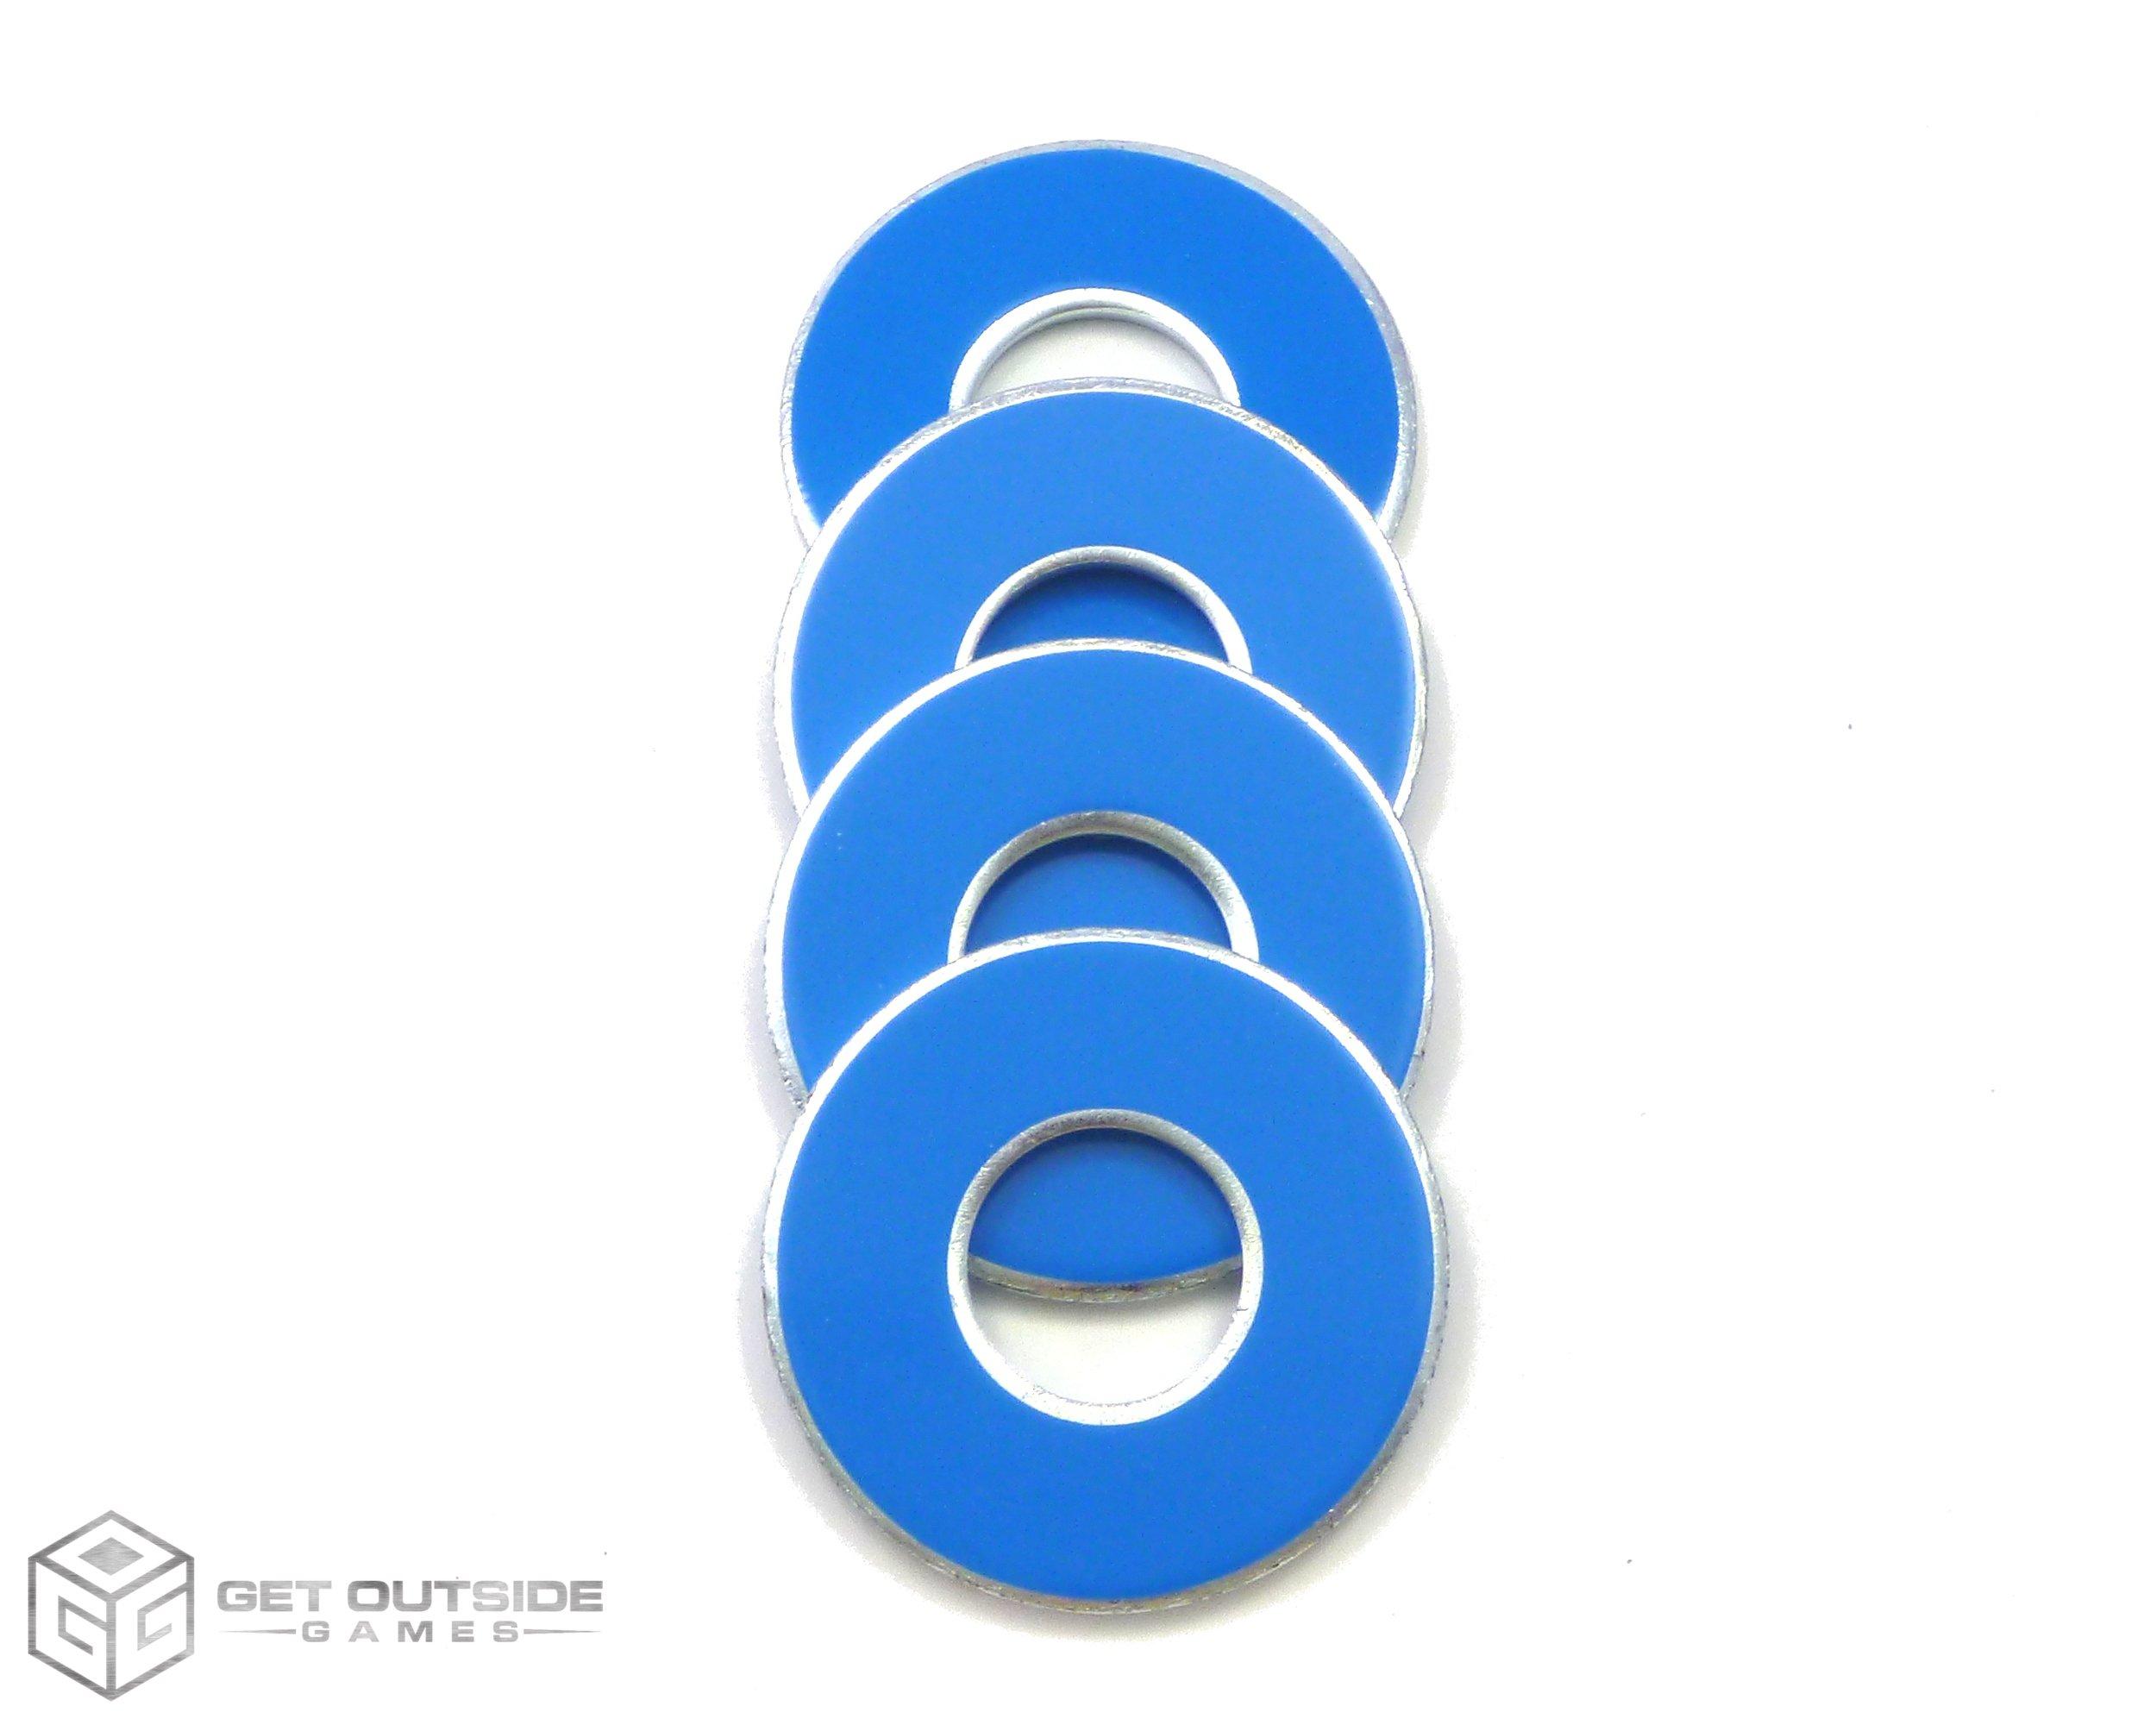 Get Outside Games 4 VVashers - Washer Toss/Washer Game Washers (Blue-Light, 4 VVashers)